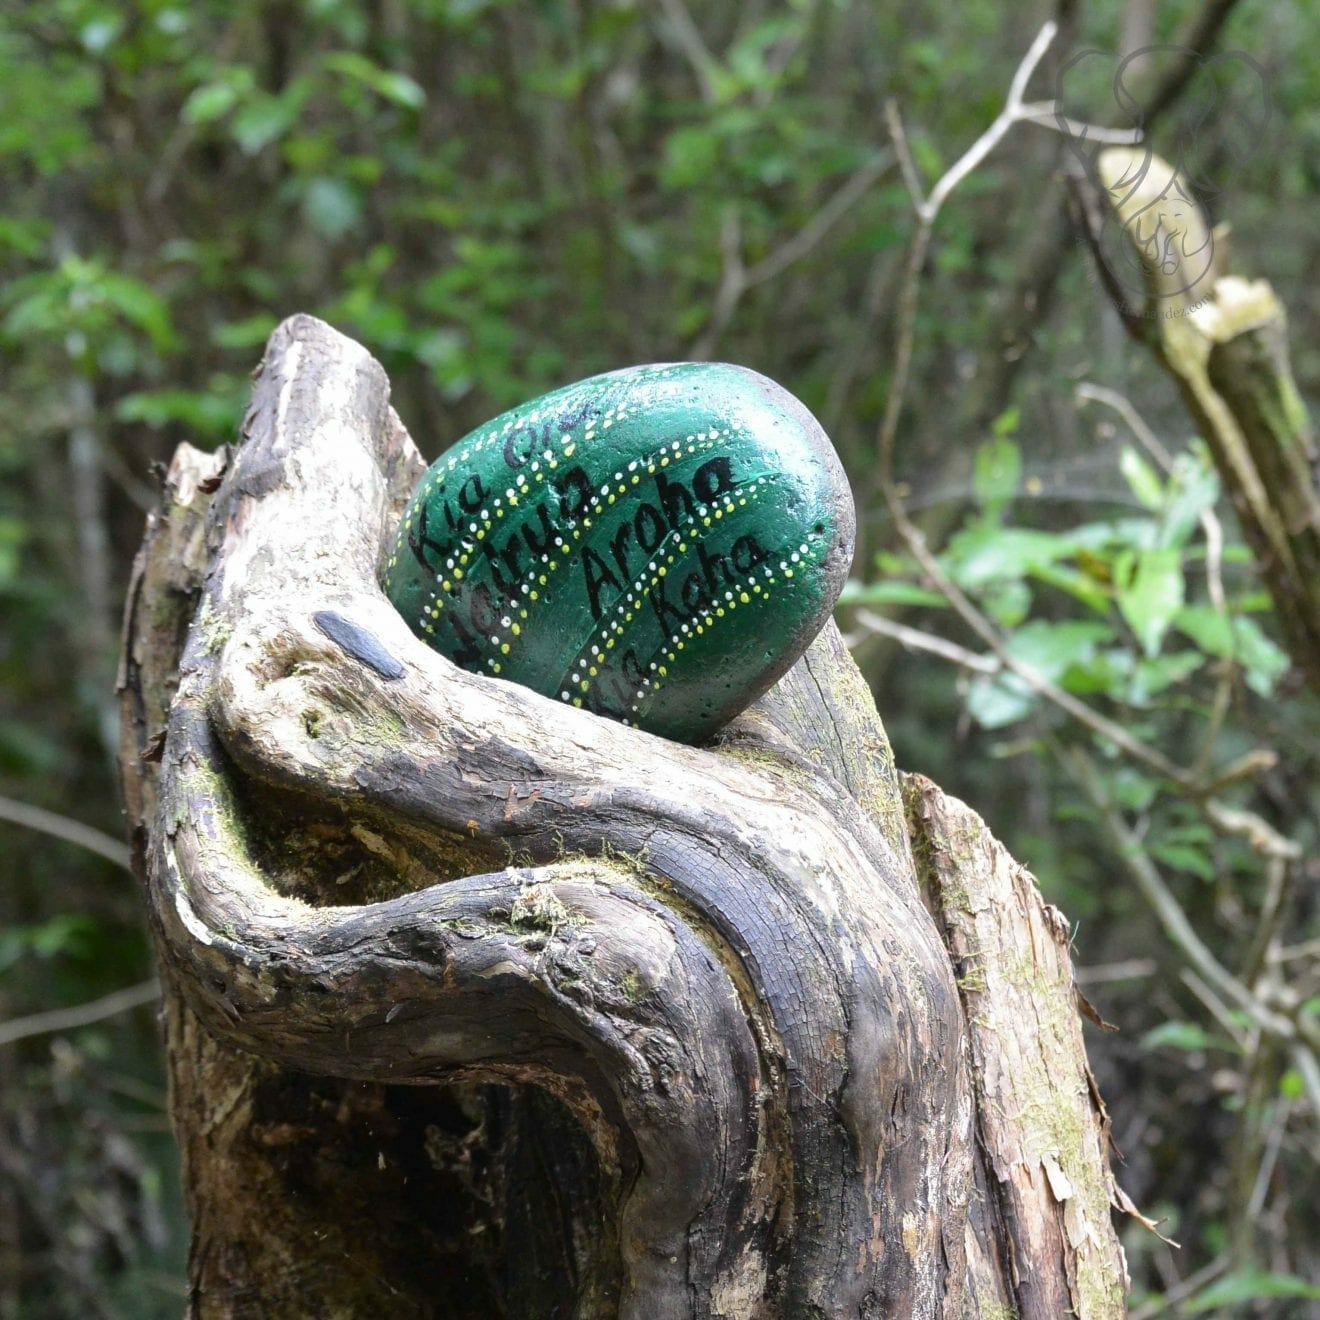 Painted rock found on the Haruru Falls trail, Waitanga, New Zealand (Miranda Hernandez)